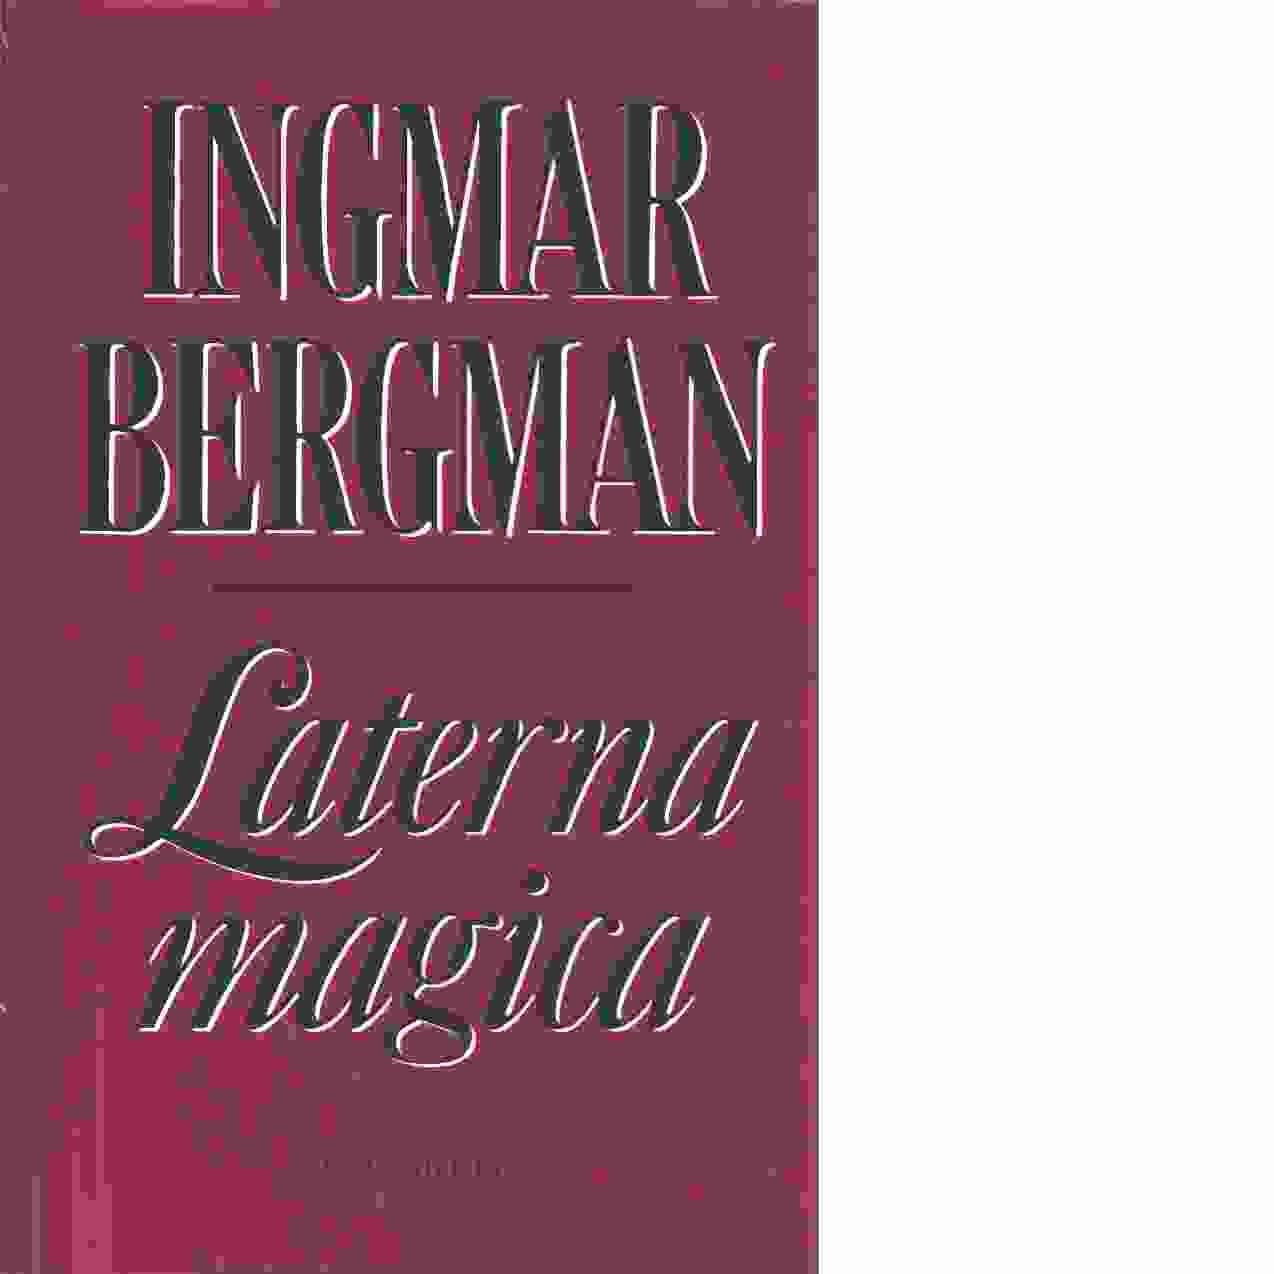 Laterna magica - Bergman, Ingmar